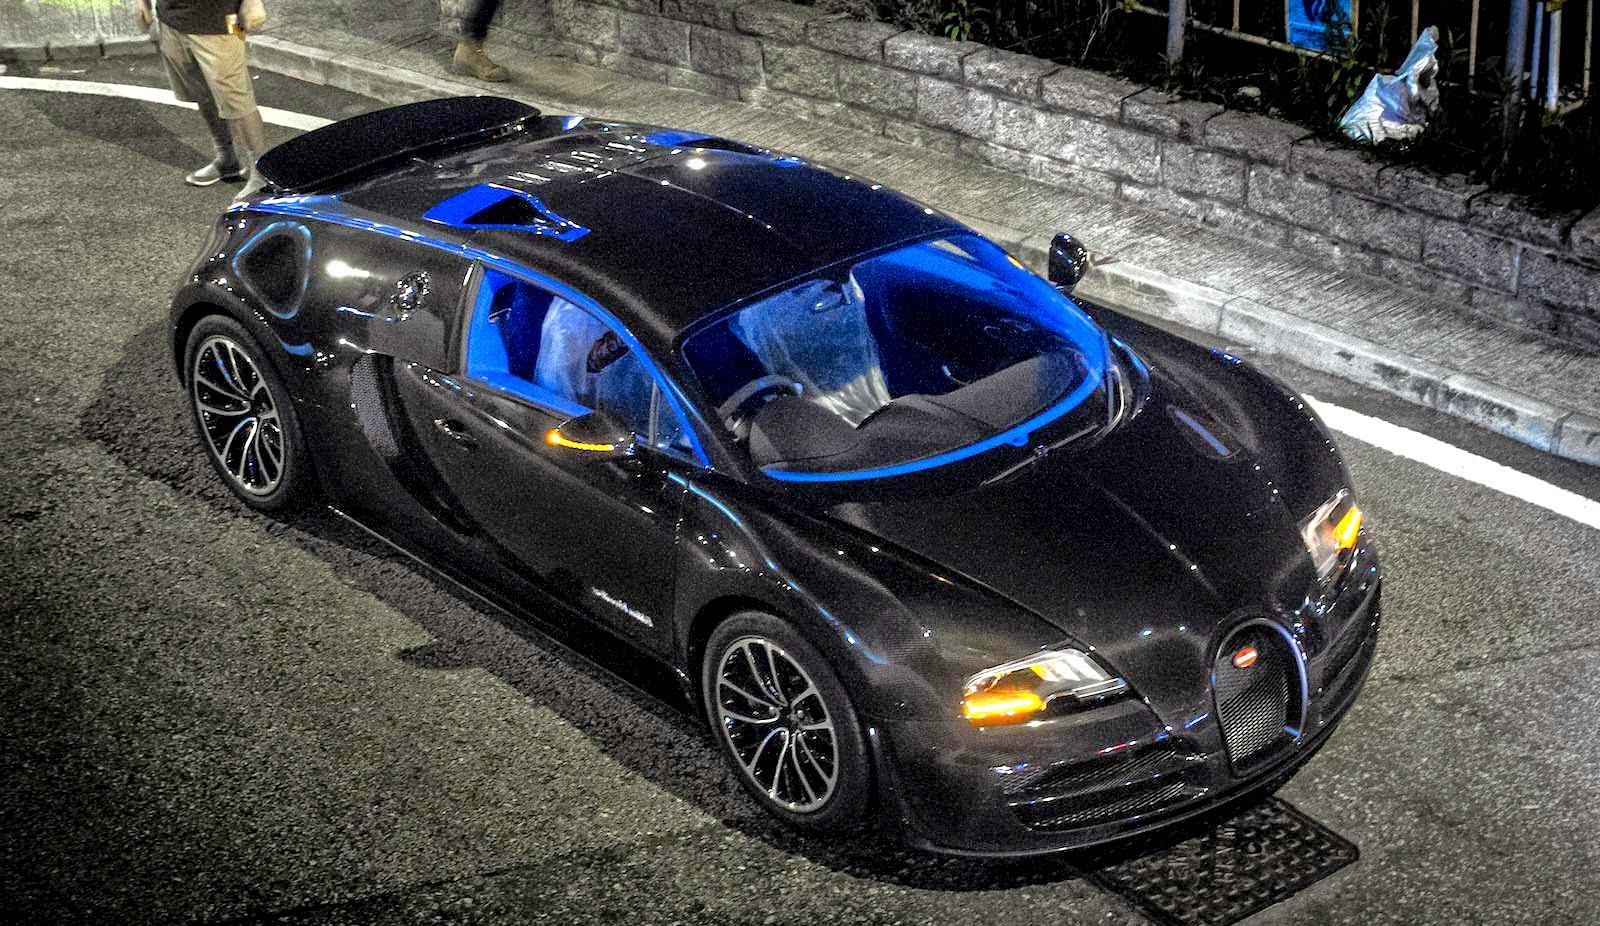 bugatti veyron super sport merveilleux edition concept sport car design. Black Bedroom Furniture Sets. Home Design Ideas